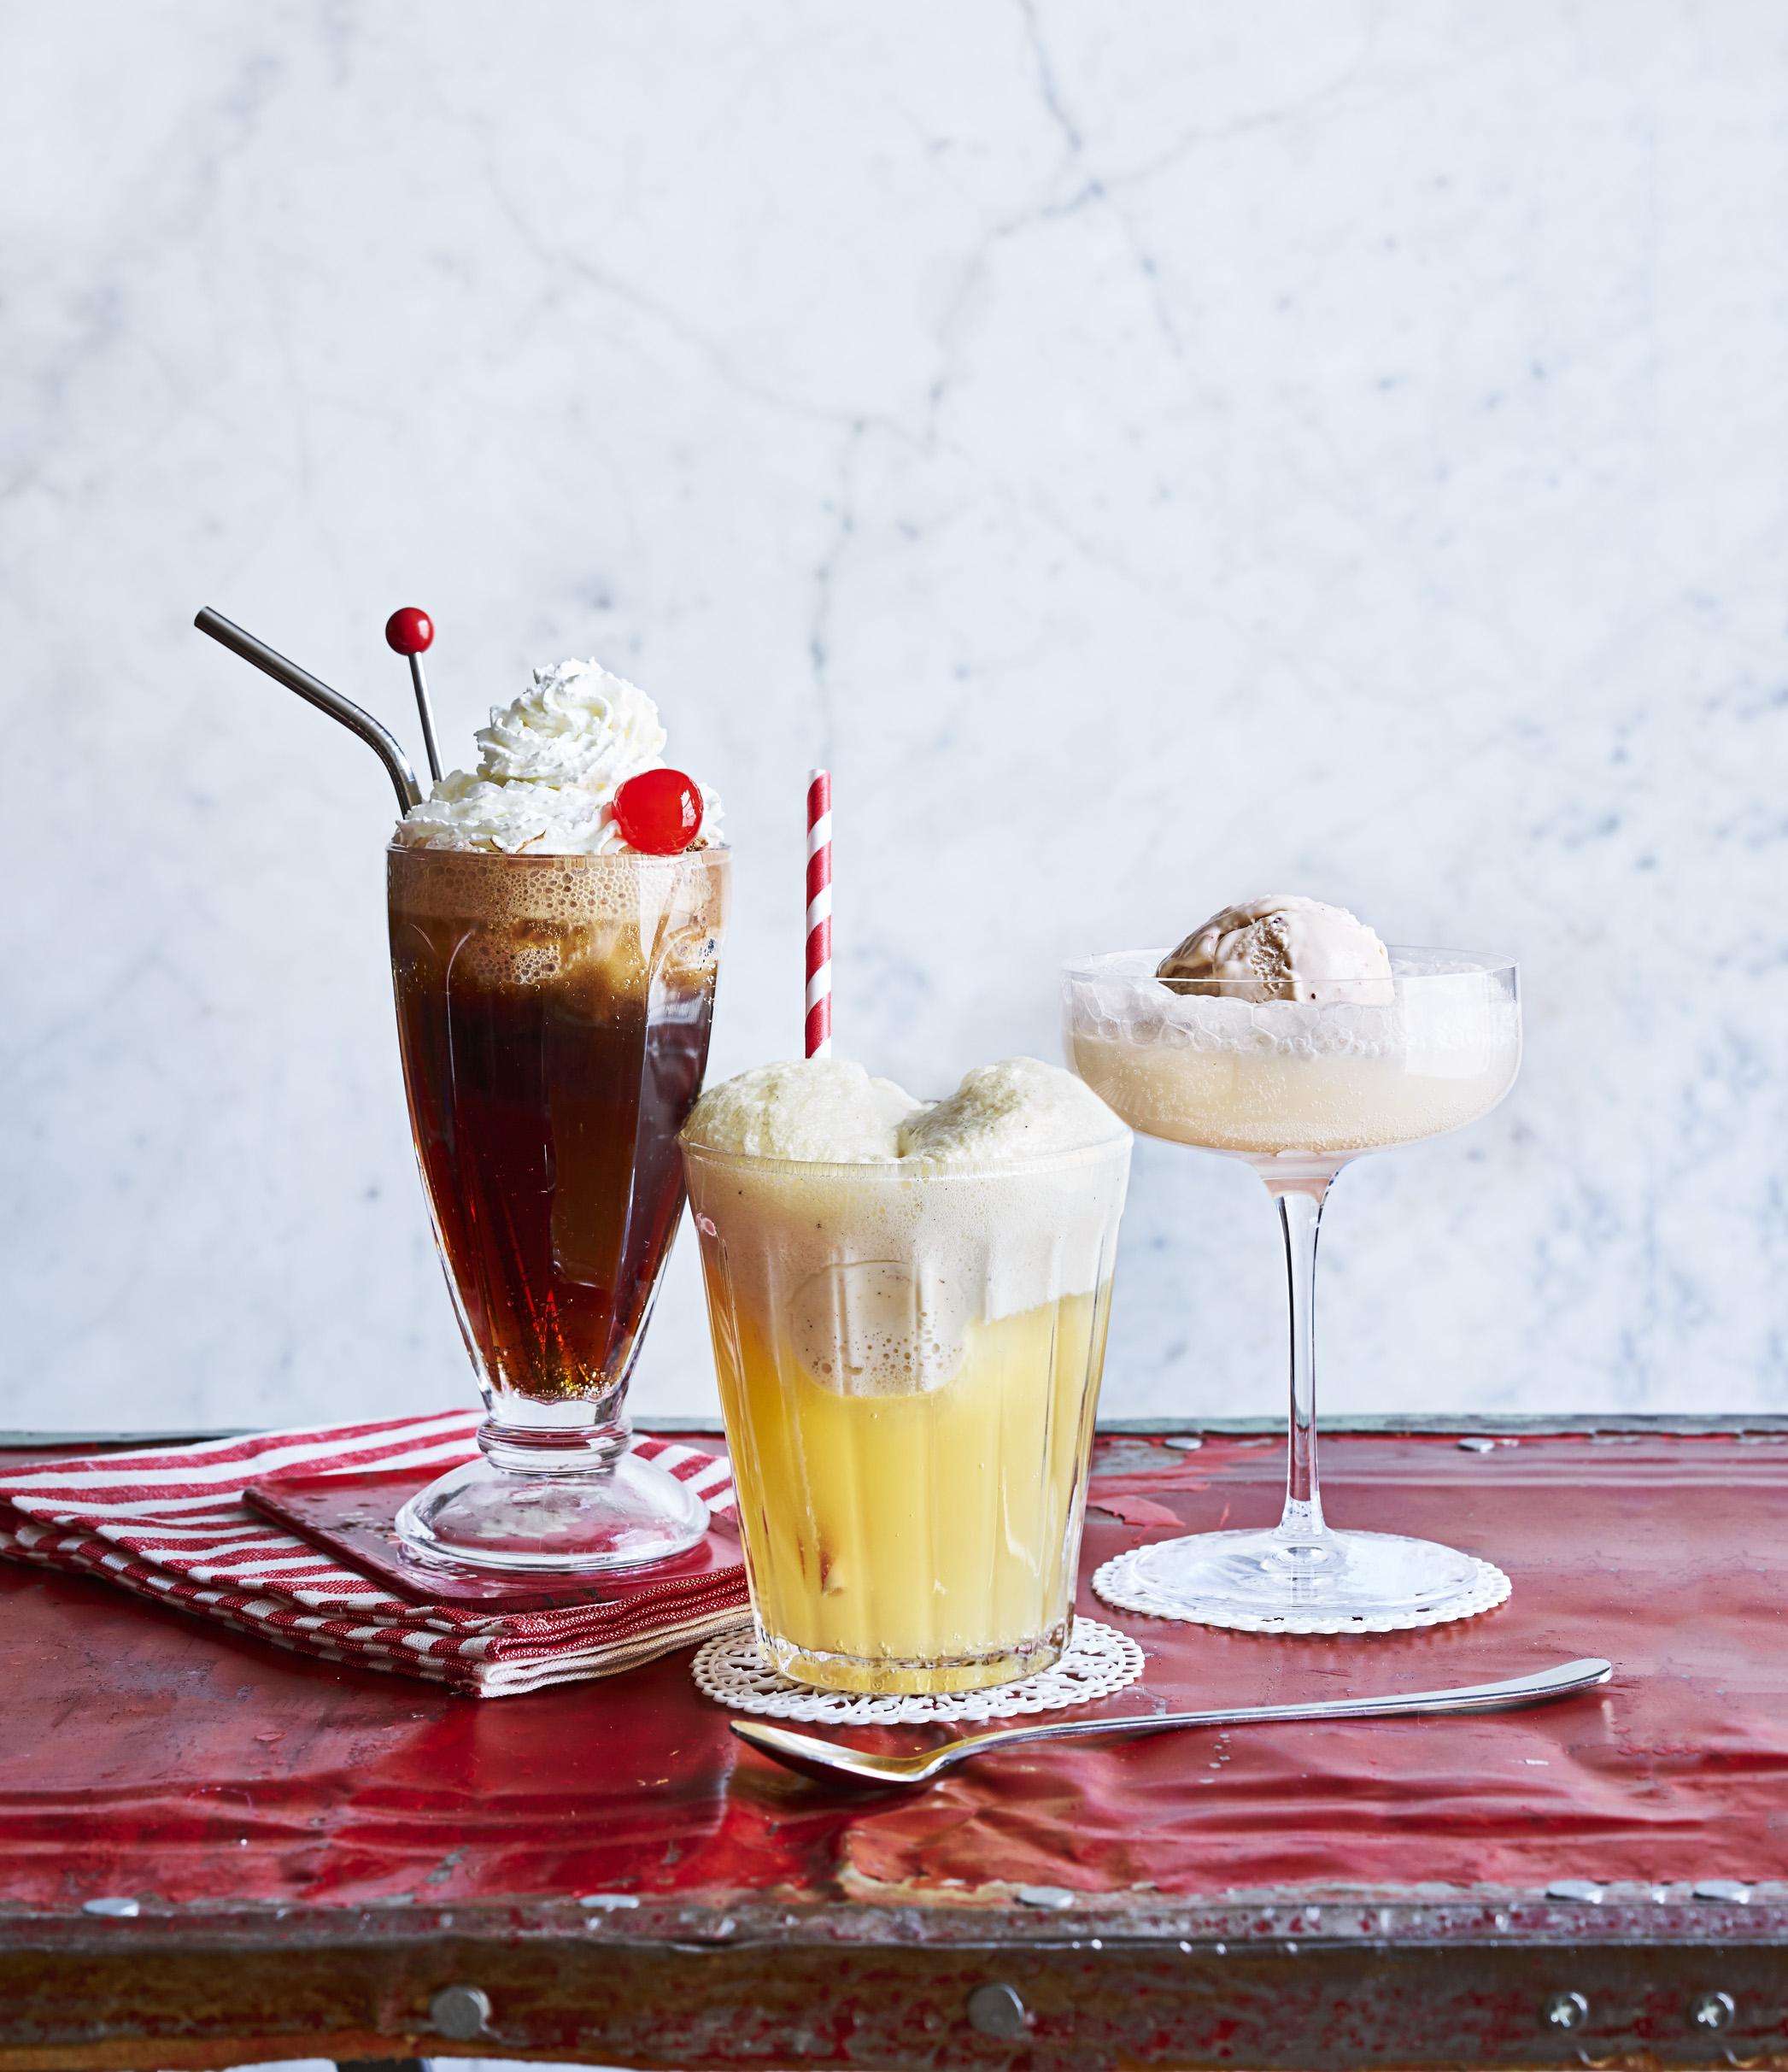 Boozy Ice Cream Float Recipes Ice Cream Toppings Olivemagazine